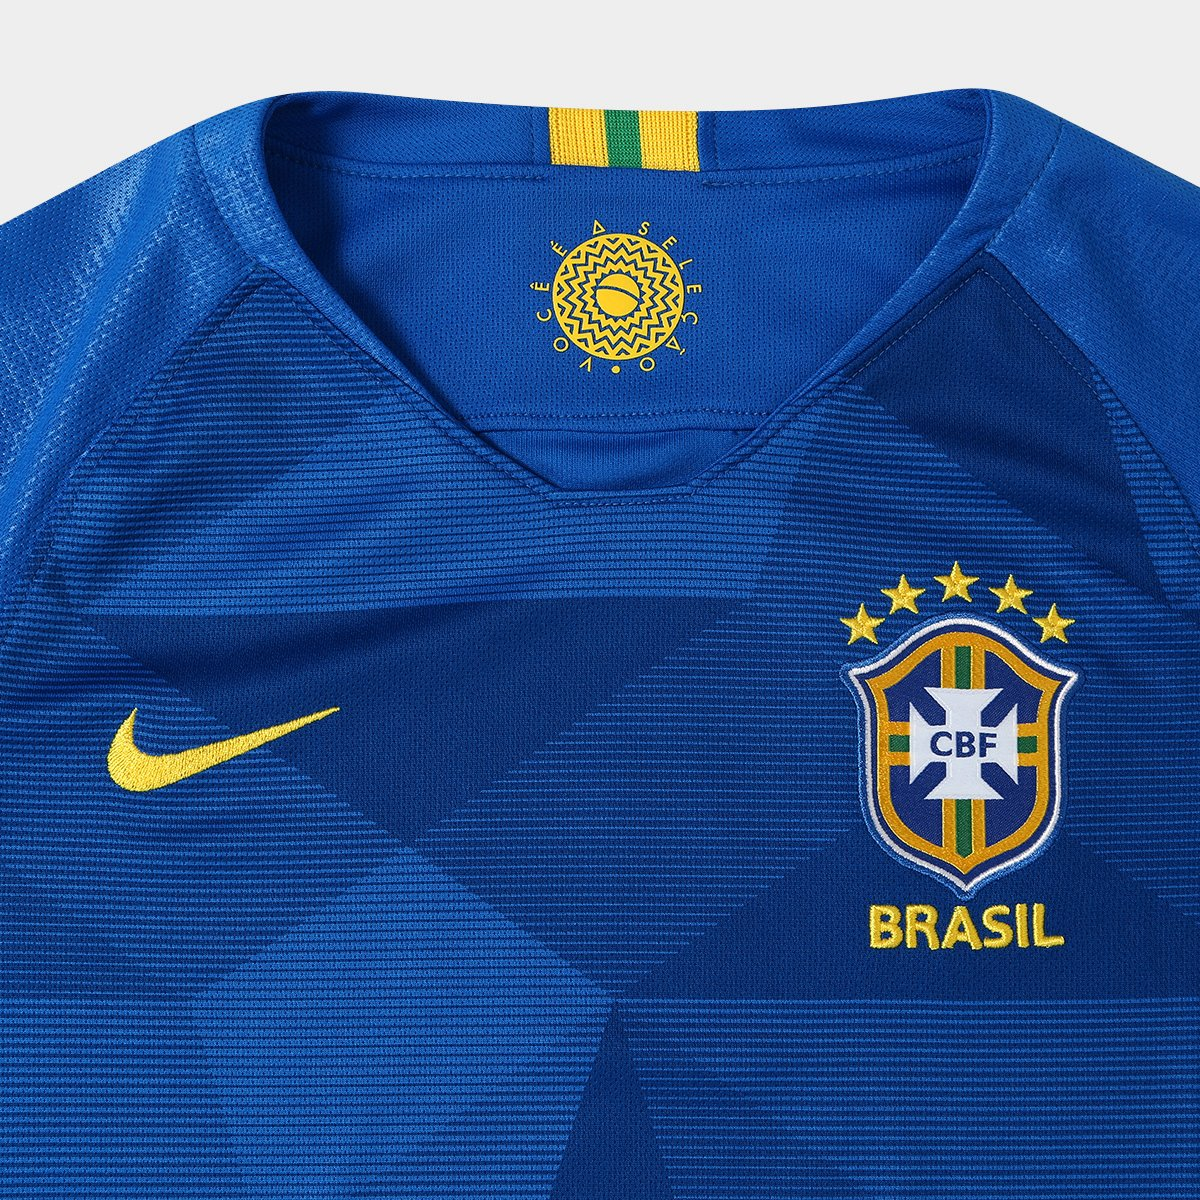 dc6983615f ... Nike Seleção Torcedor II Neymar Jr 2018 nº Camisa Azul Brasil Juvenil  10 ZgwxUgvTq ...